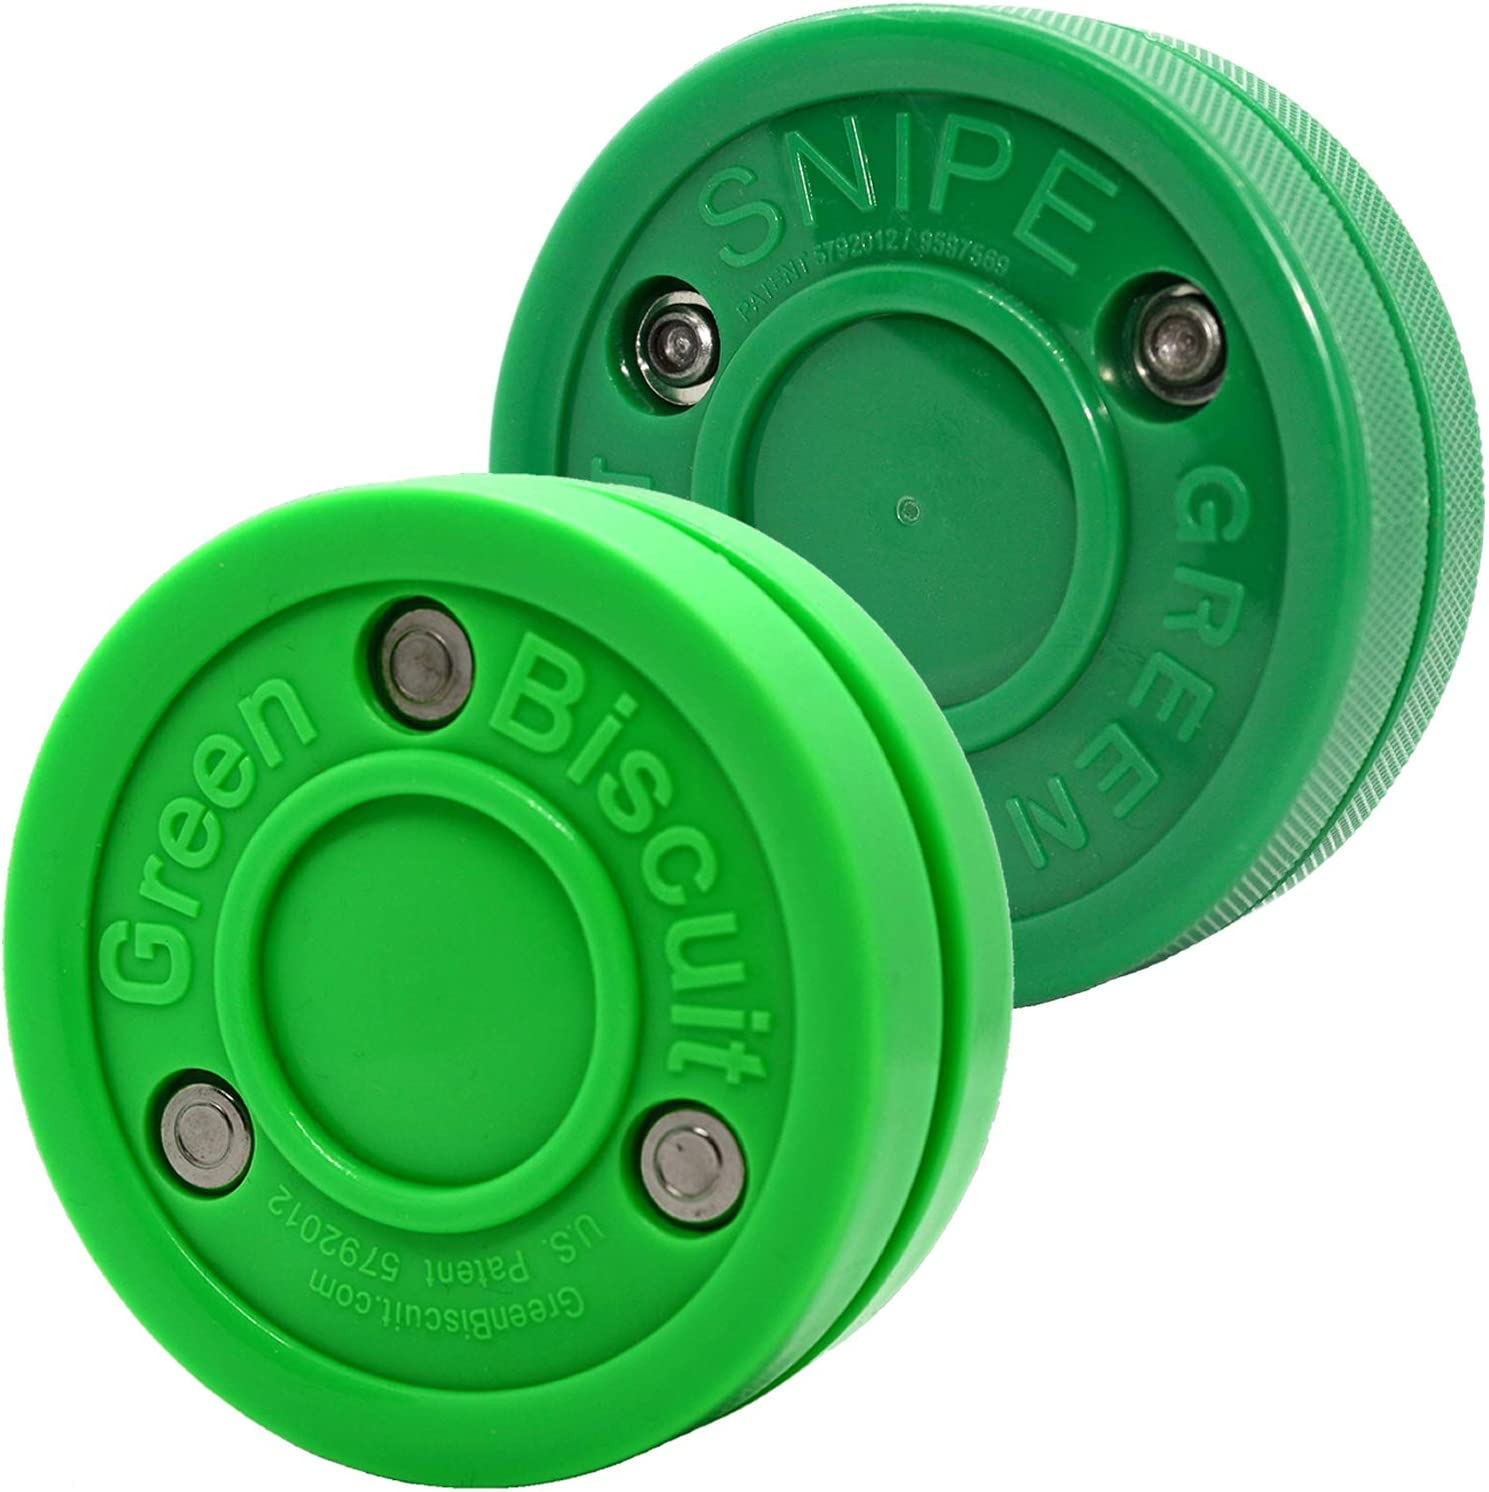 Green Biscuit Snipe Hockey Shooting// Passing Training Puck Street Stick Handling